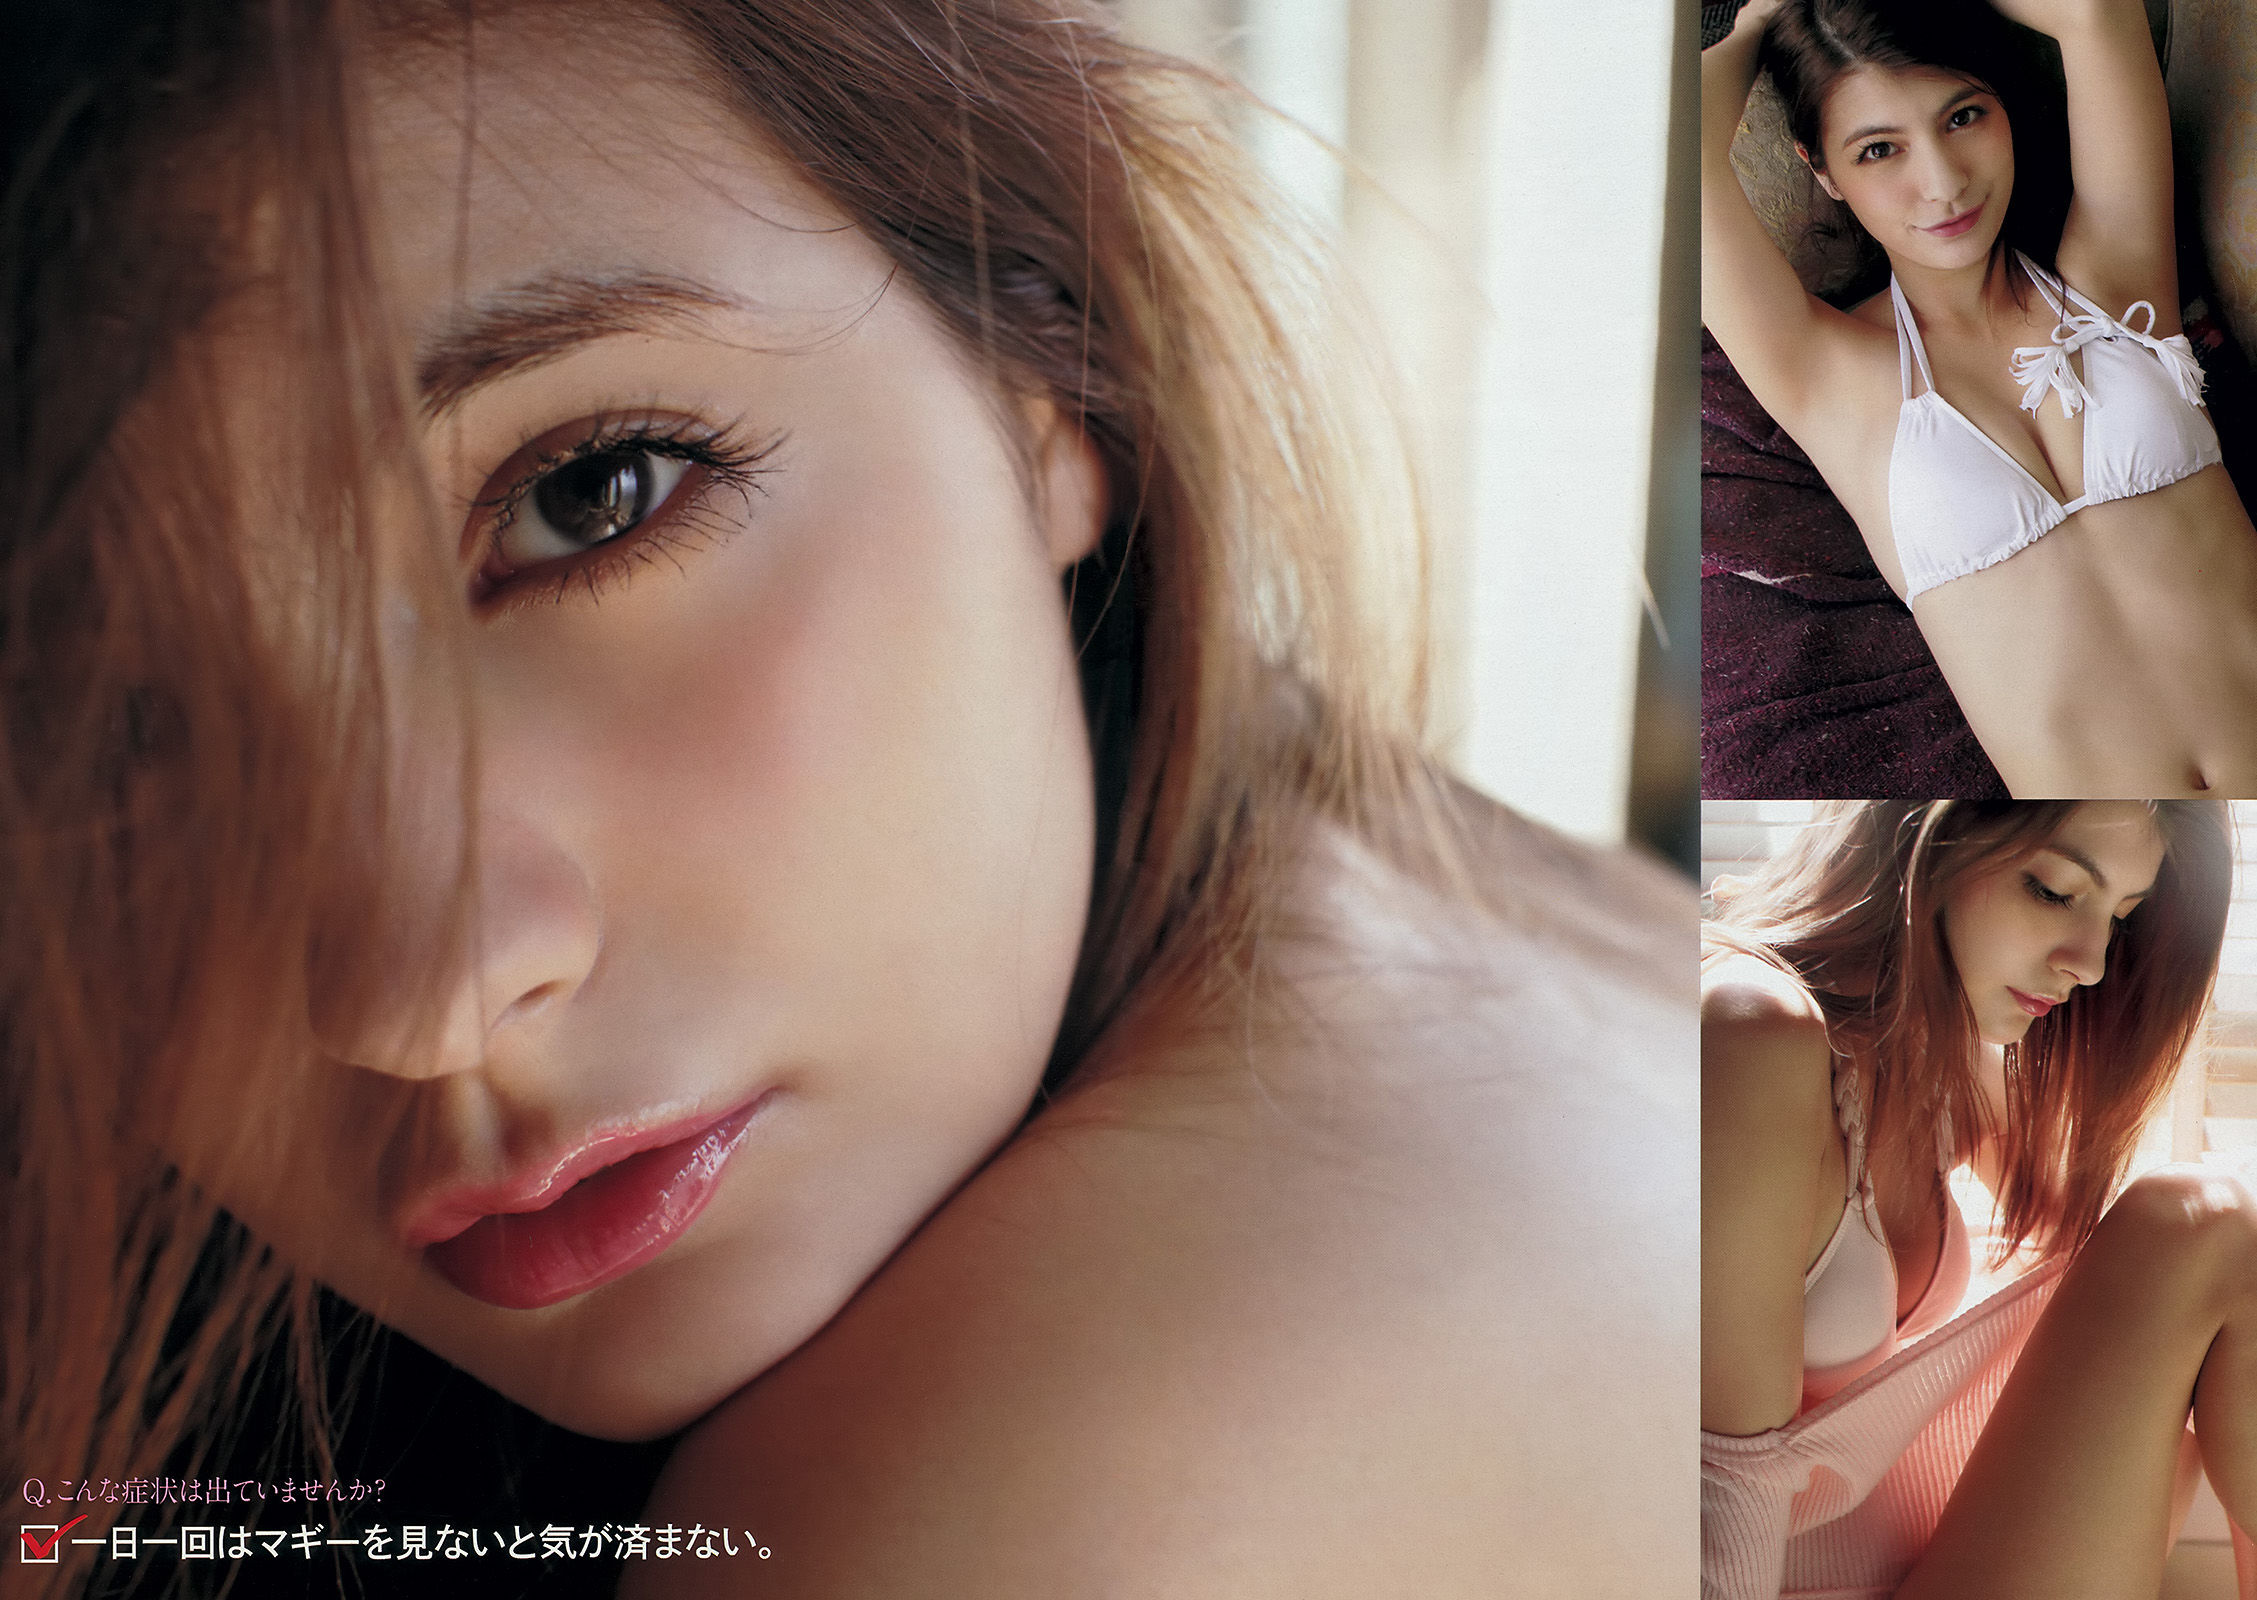 [Young Magazine杂志写真]マギー超高清写真大图片(10P)|84热度